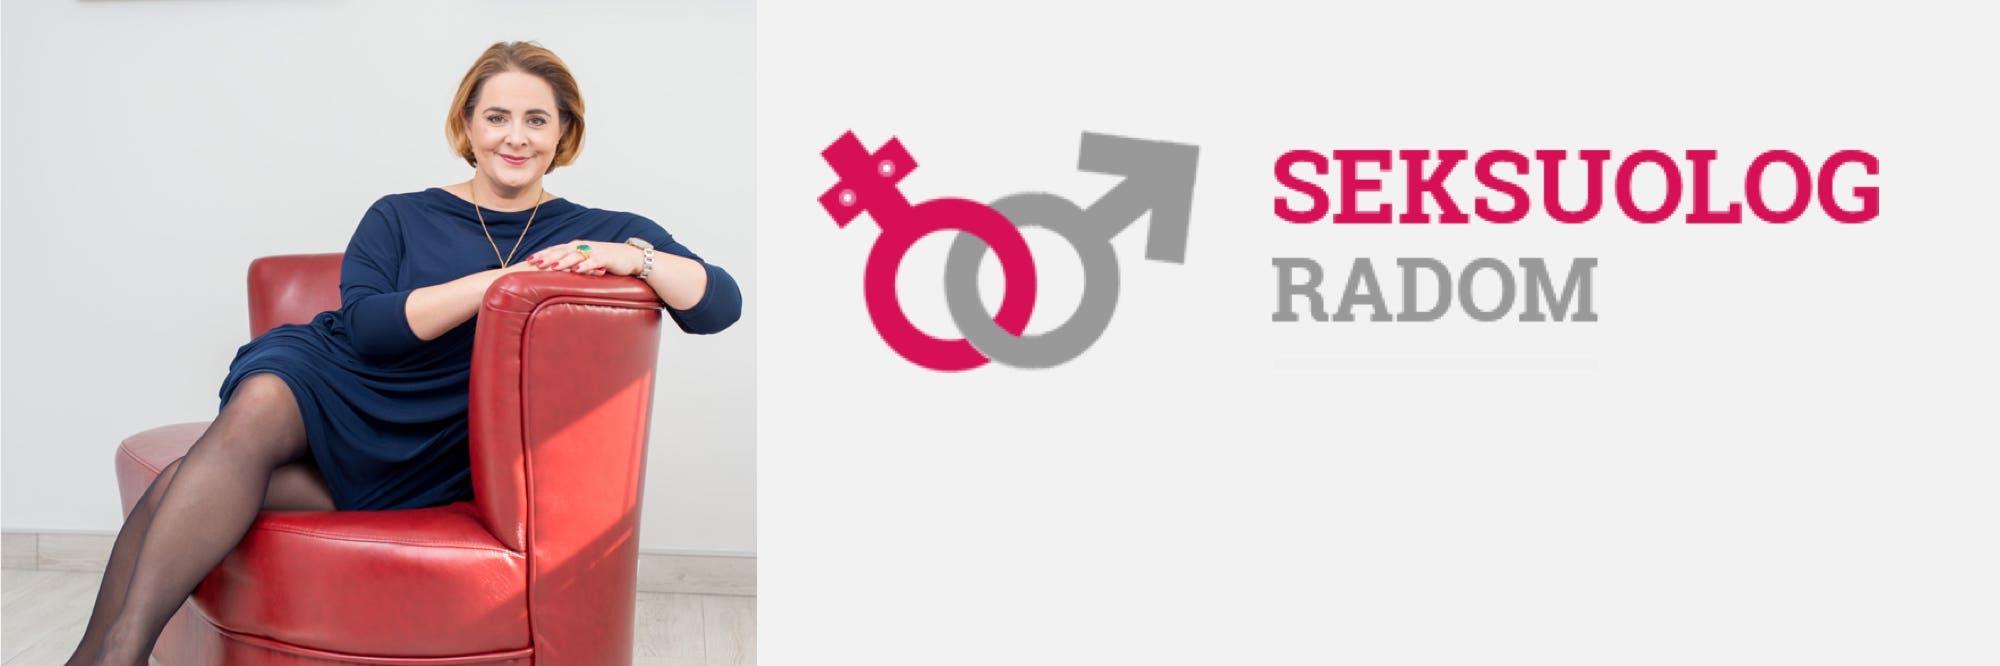 kobieca seksualność